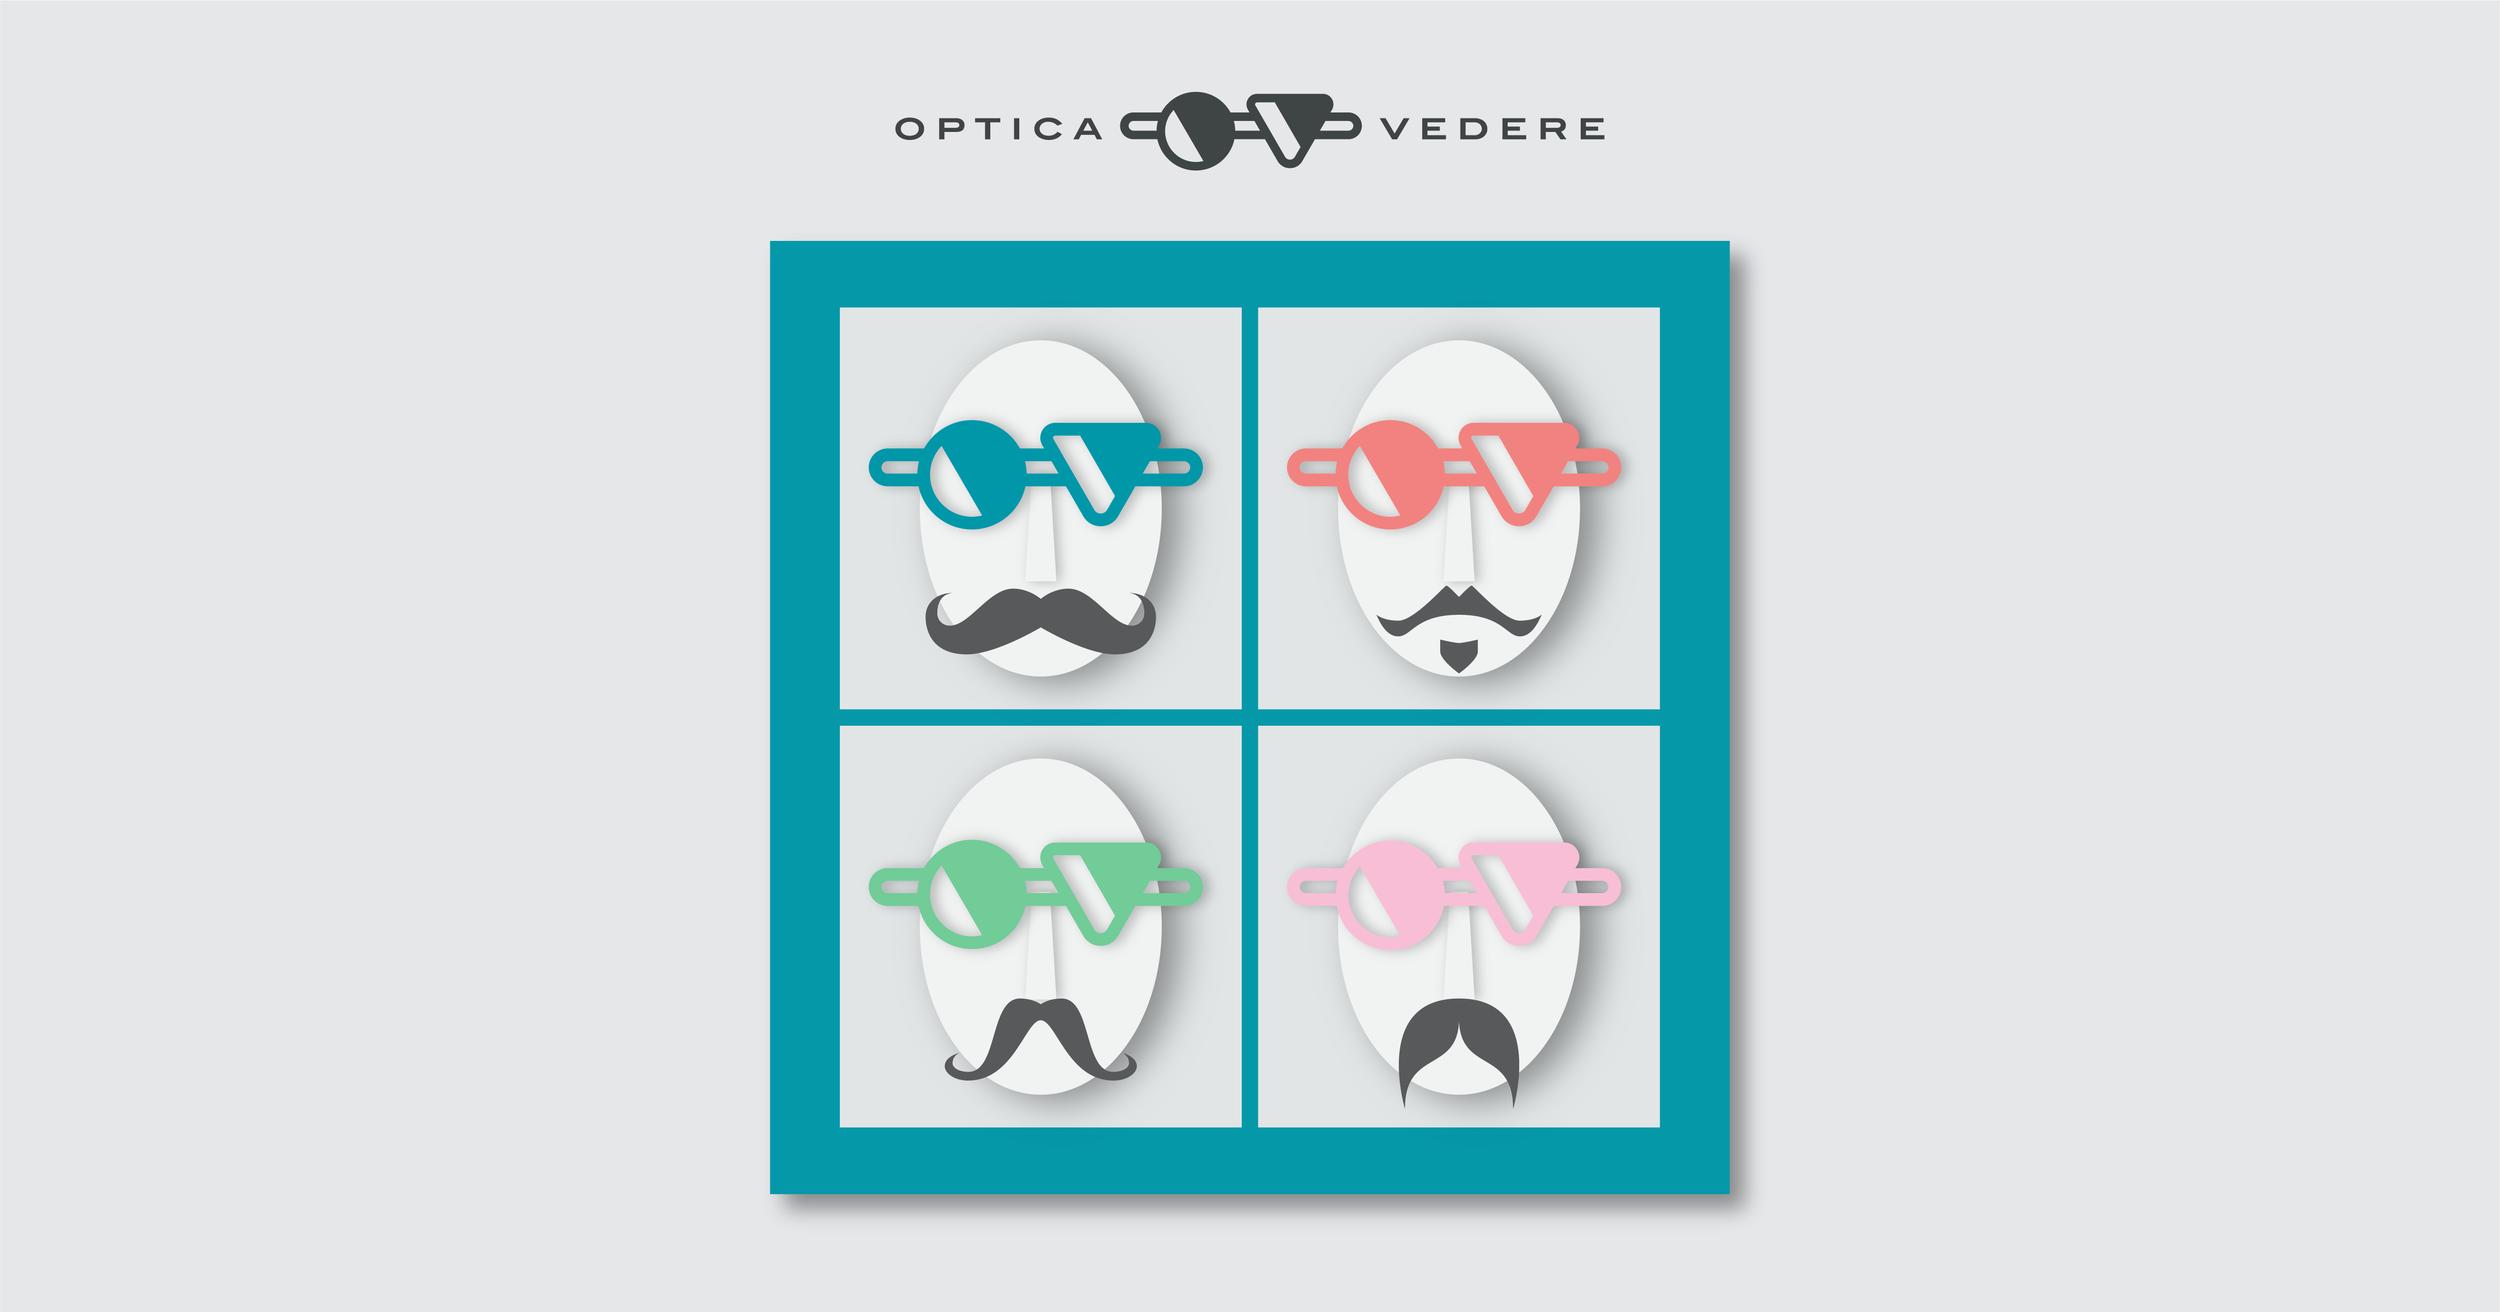 optica_vedere_design-02.png